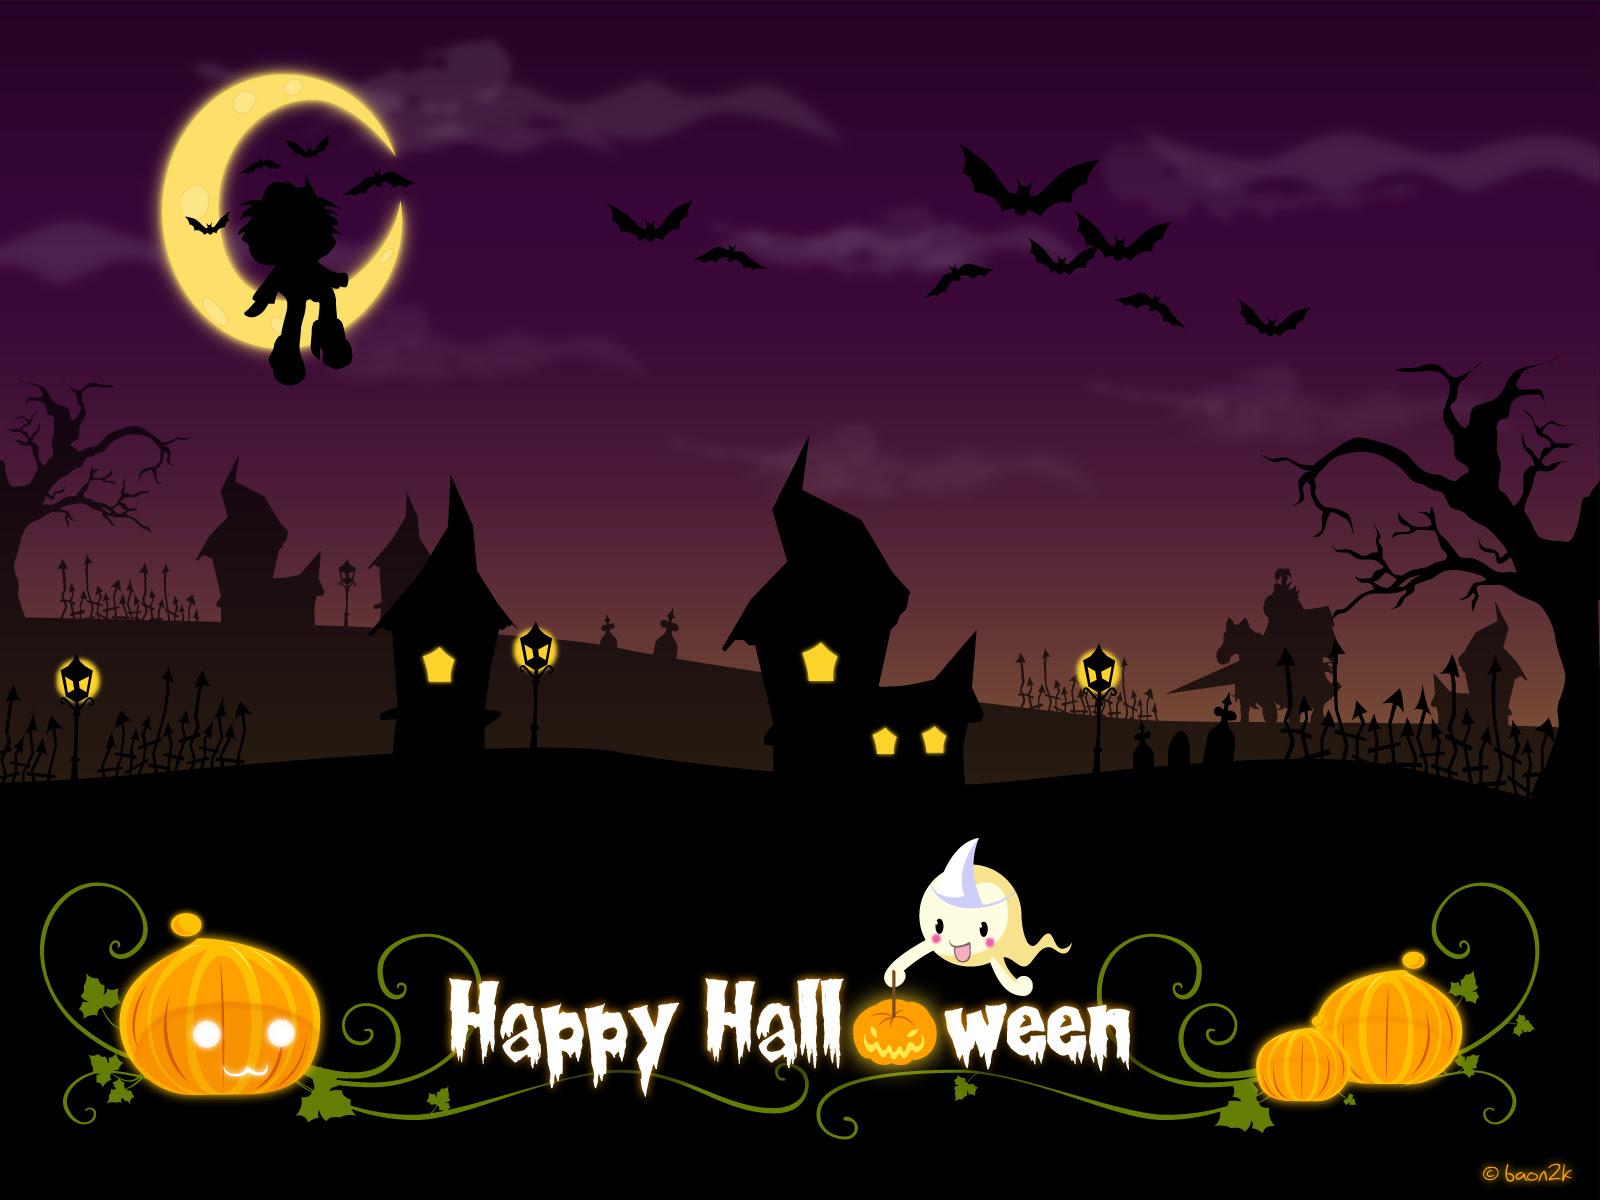 60 cute Halloween wallpapers HQ  Deepak.C